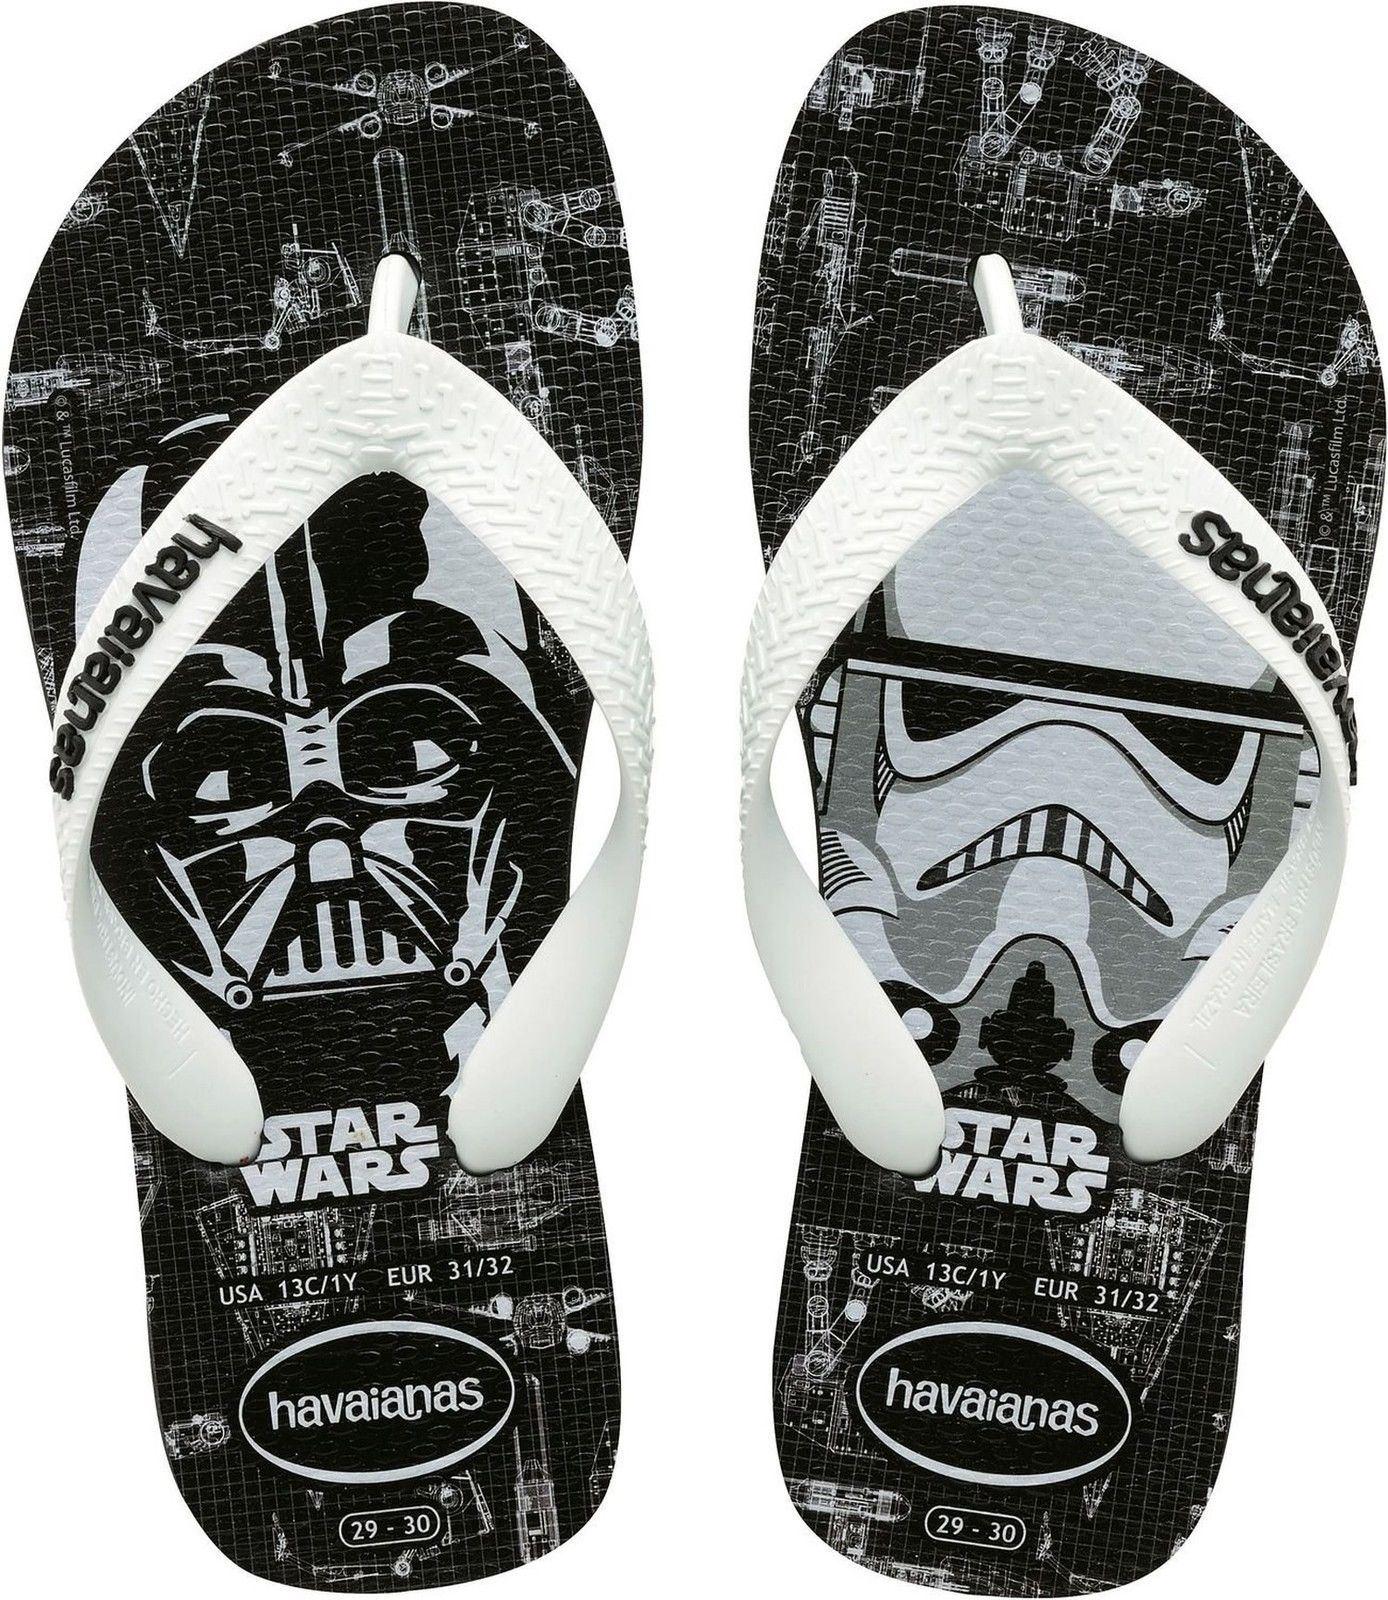 ea38de20a617ba Havaianas Genuine Men Youth Star Wars Rubber Slip On Flip Flop Black White